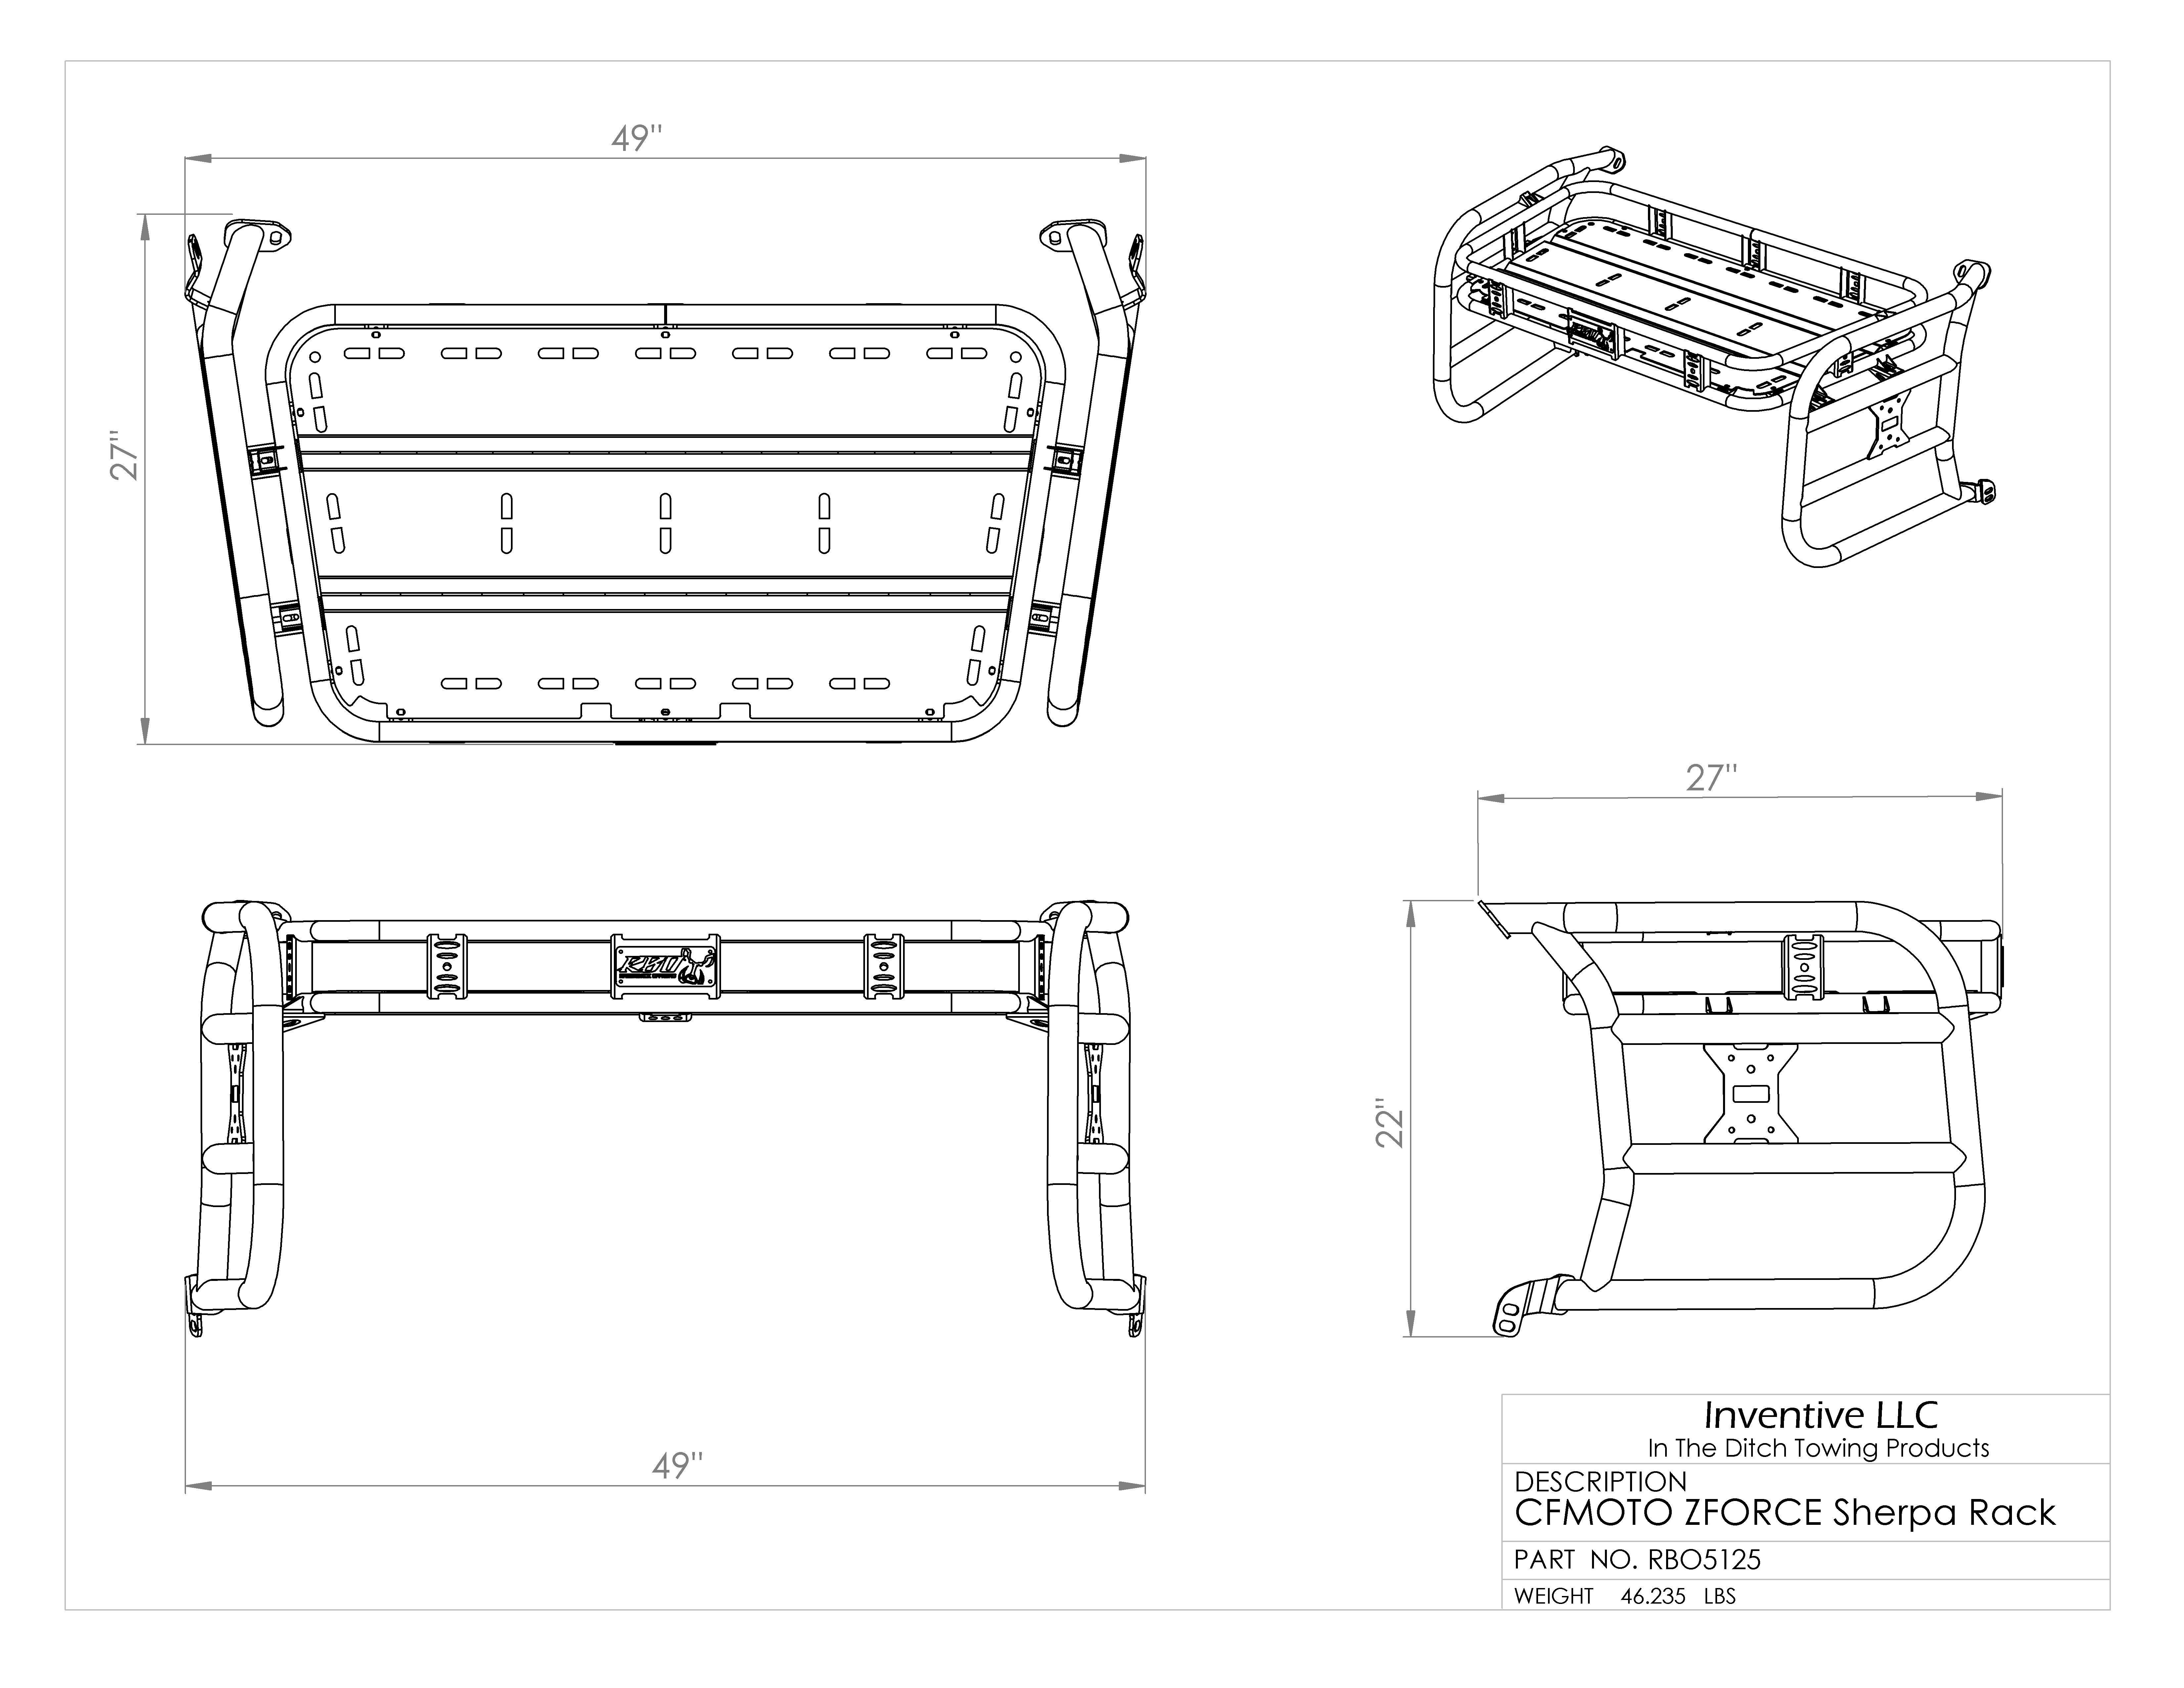 Cfmoto Zforce Sherpa Rack Razorback Offroad Cf Moto Utv 500 Wiring Diagram Dimensions Operations Manual